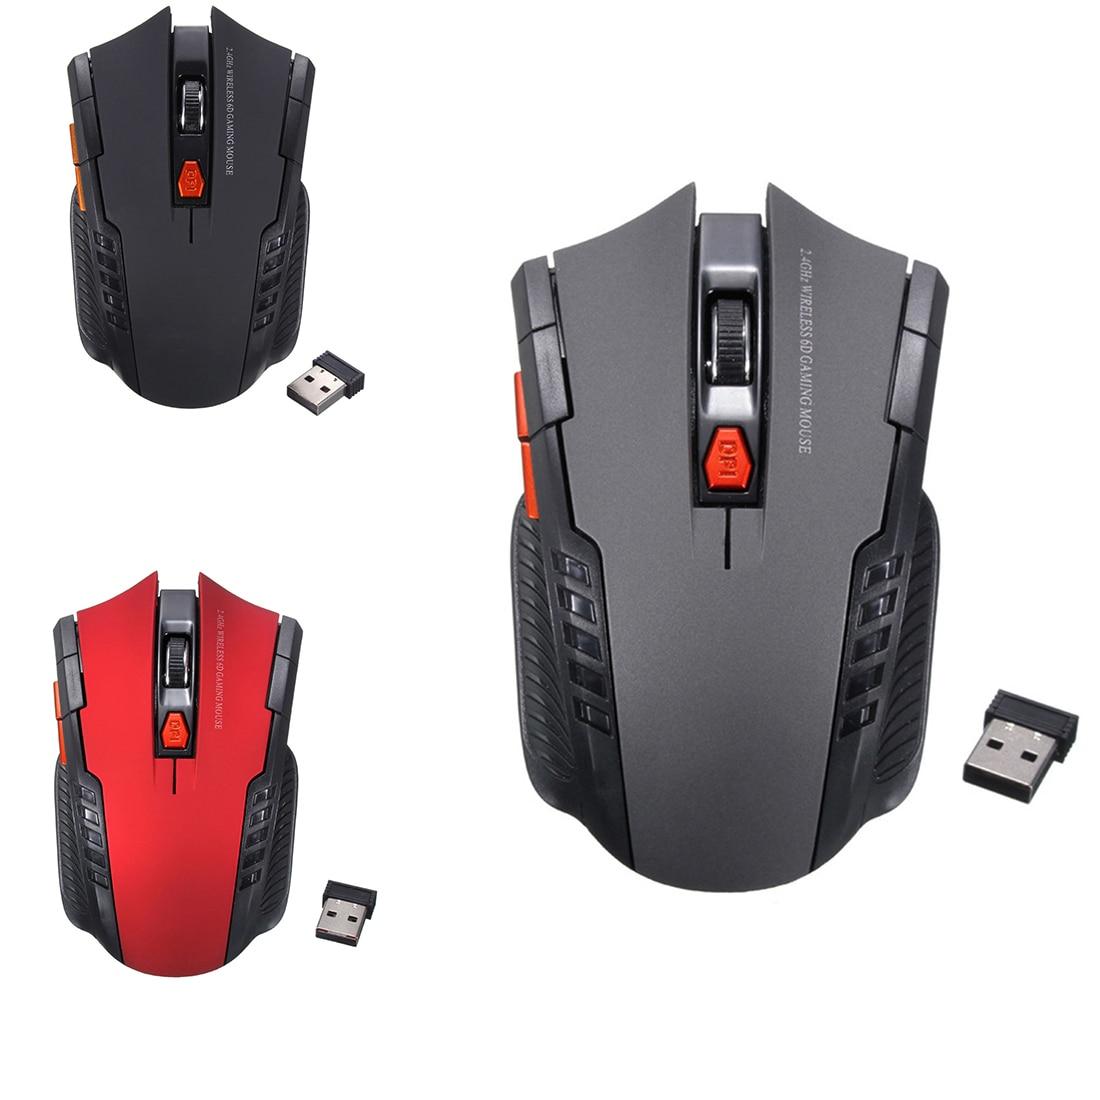 Etmakit  2.4Ghz Mini Portable Wireless Optical 2000DPI Adjustable Professional Gaming Game Mouse Mice For PC Laptop Desktop